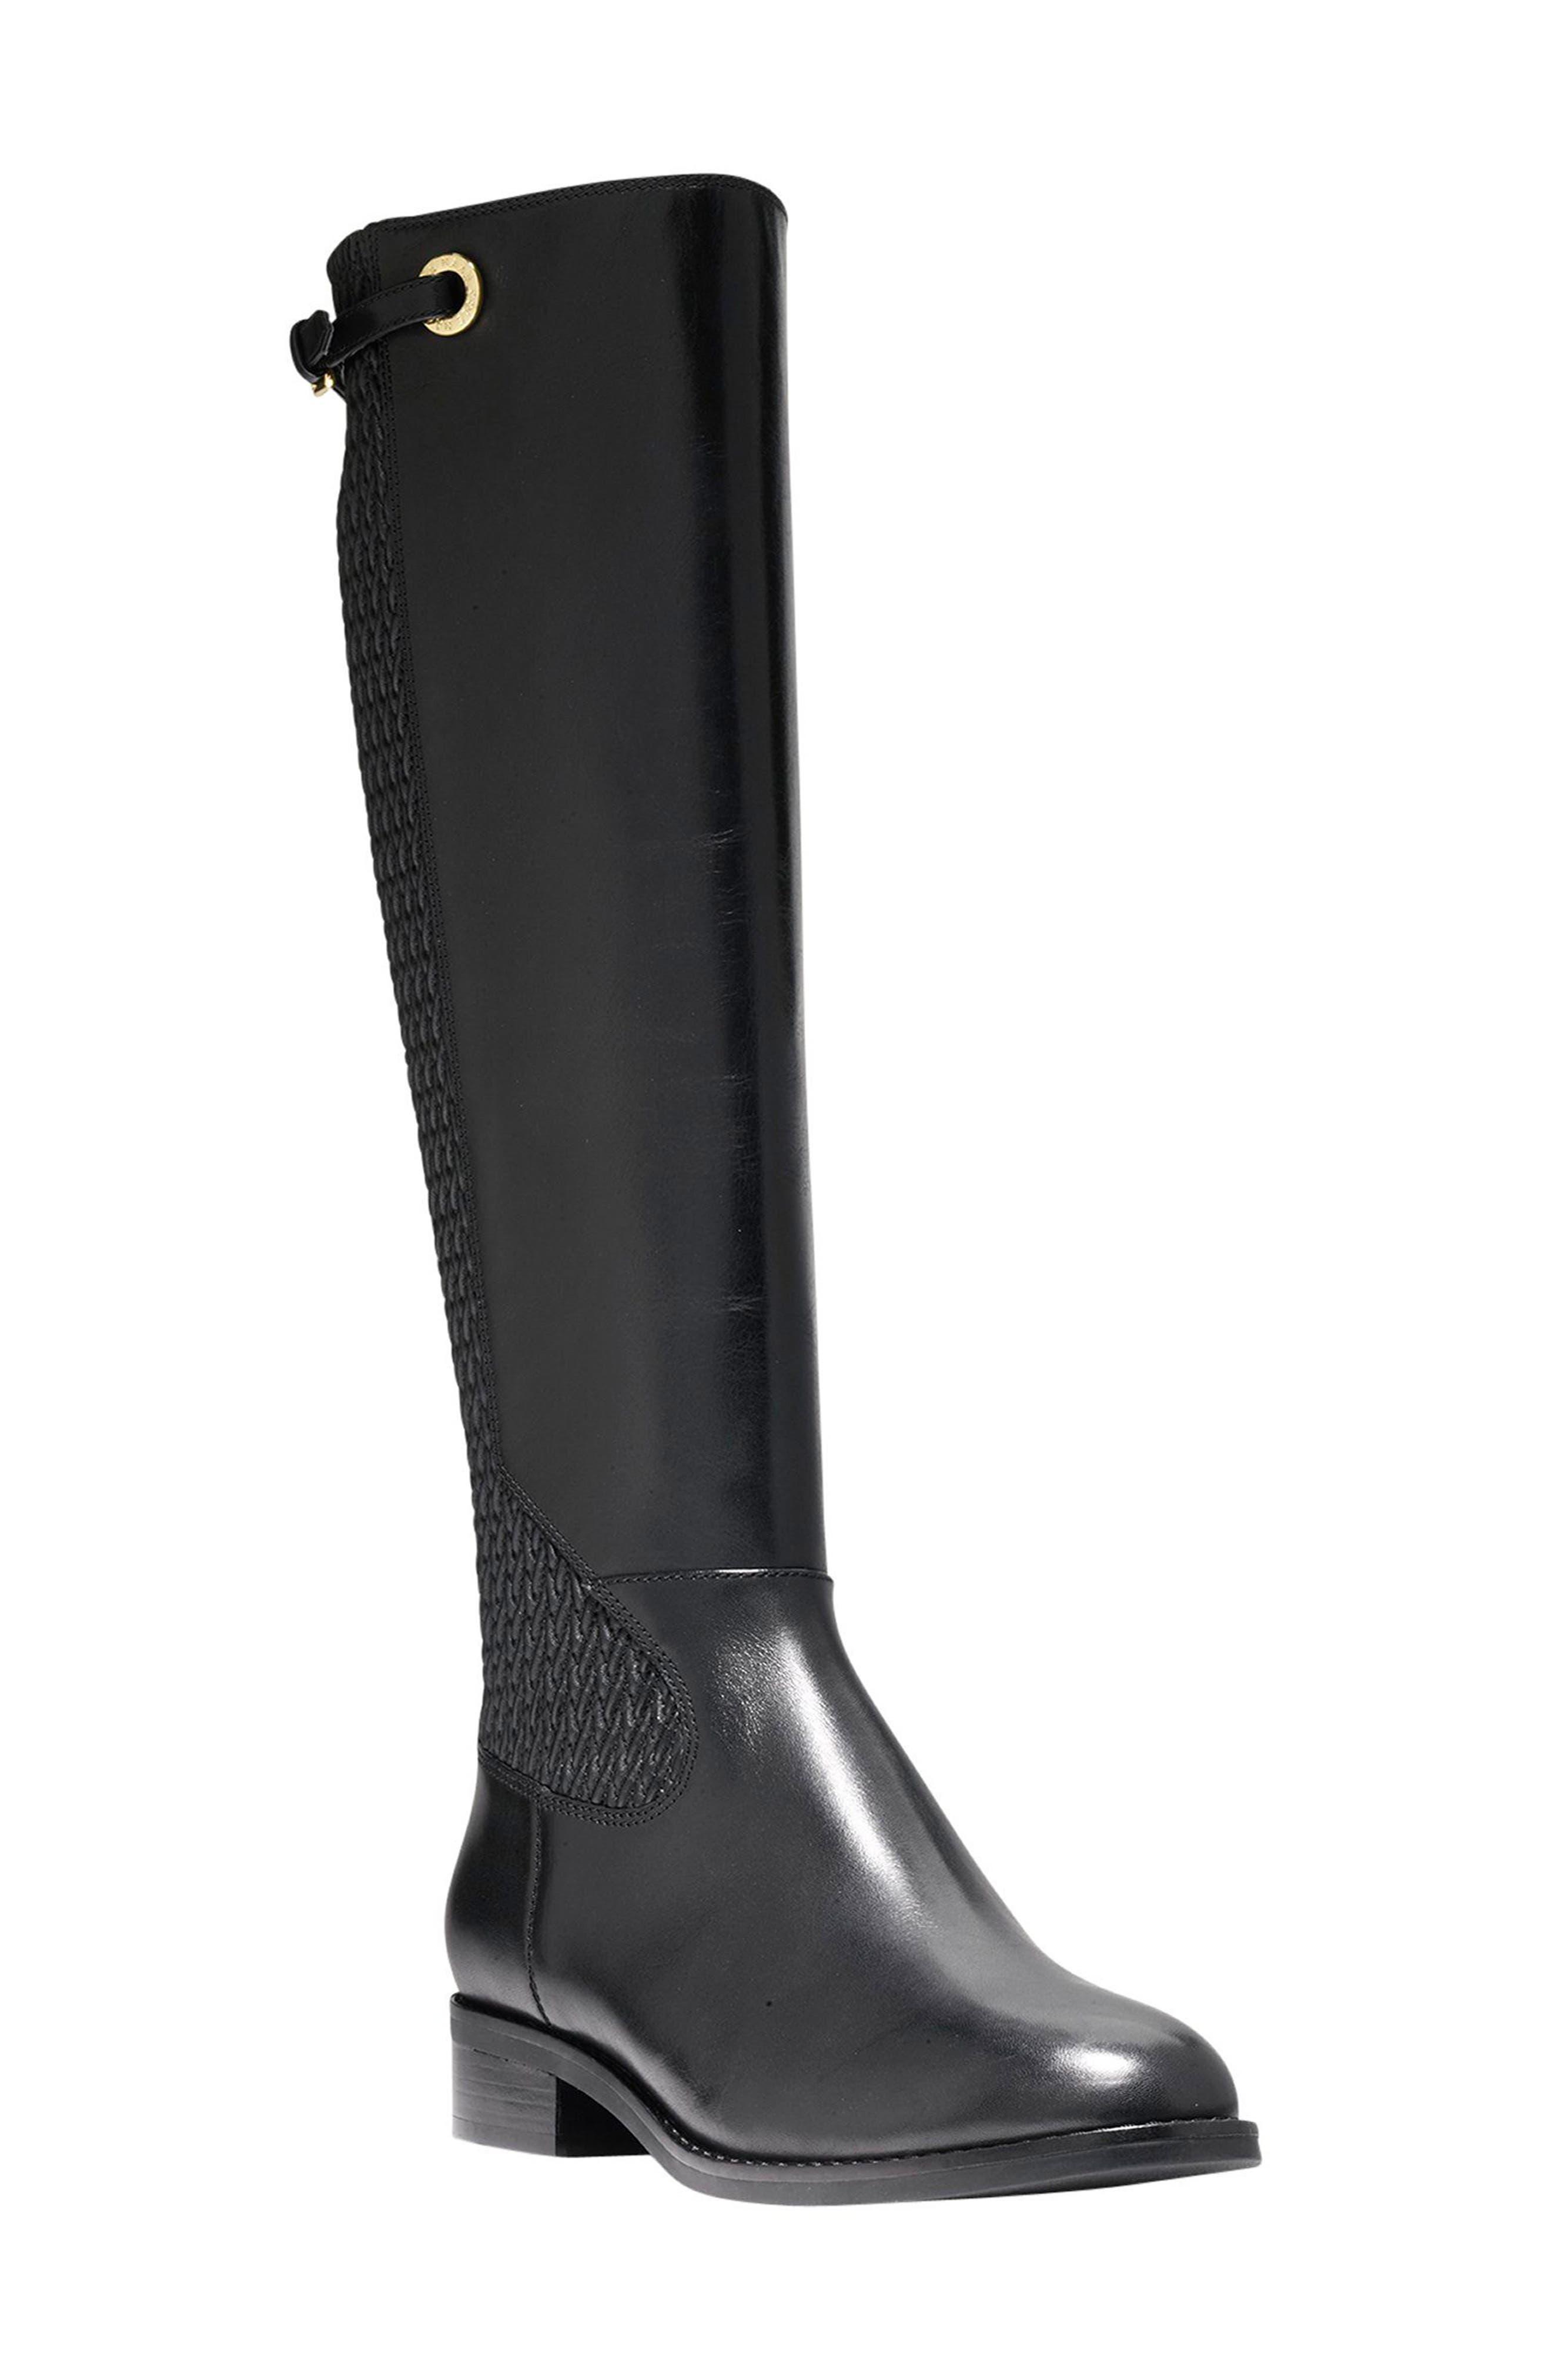 Main Image - Cole Haan Simona Tall Boot (Women)